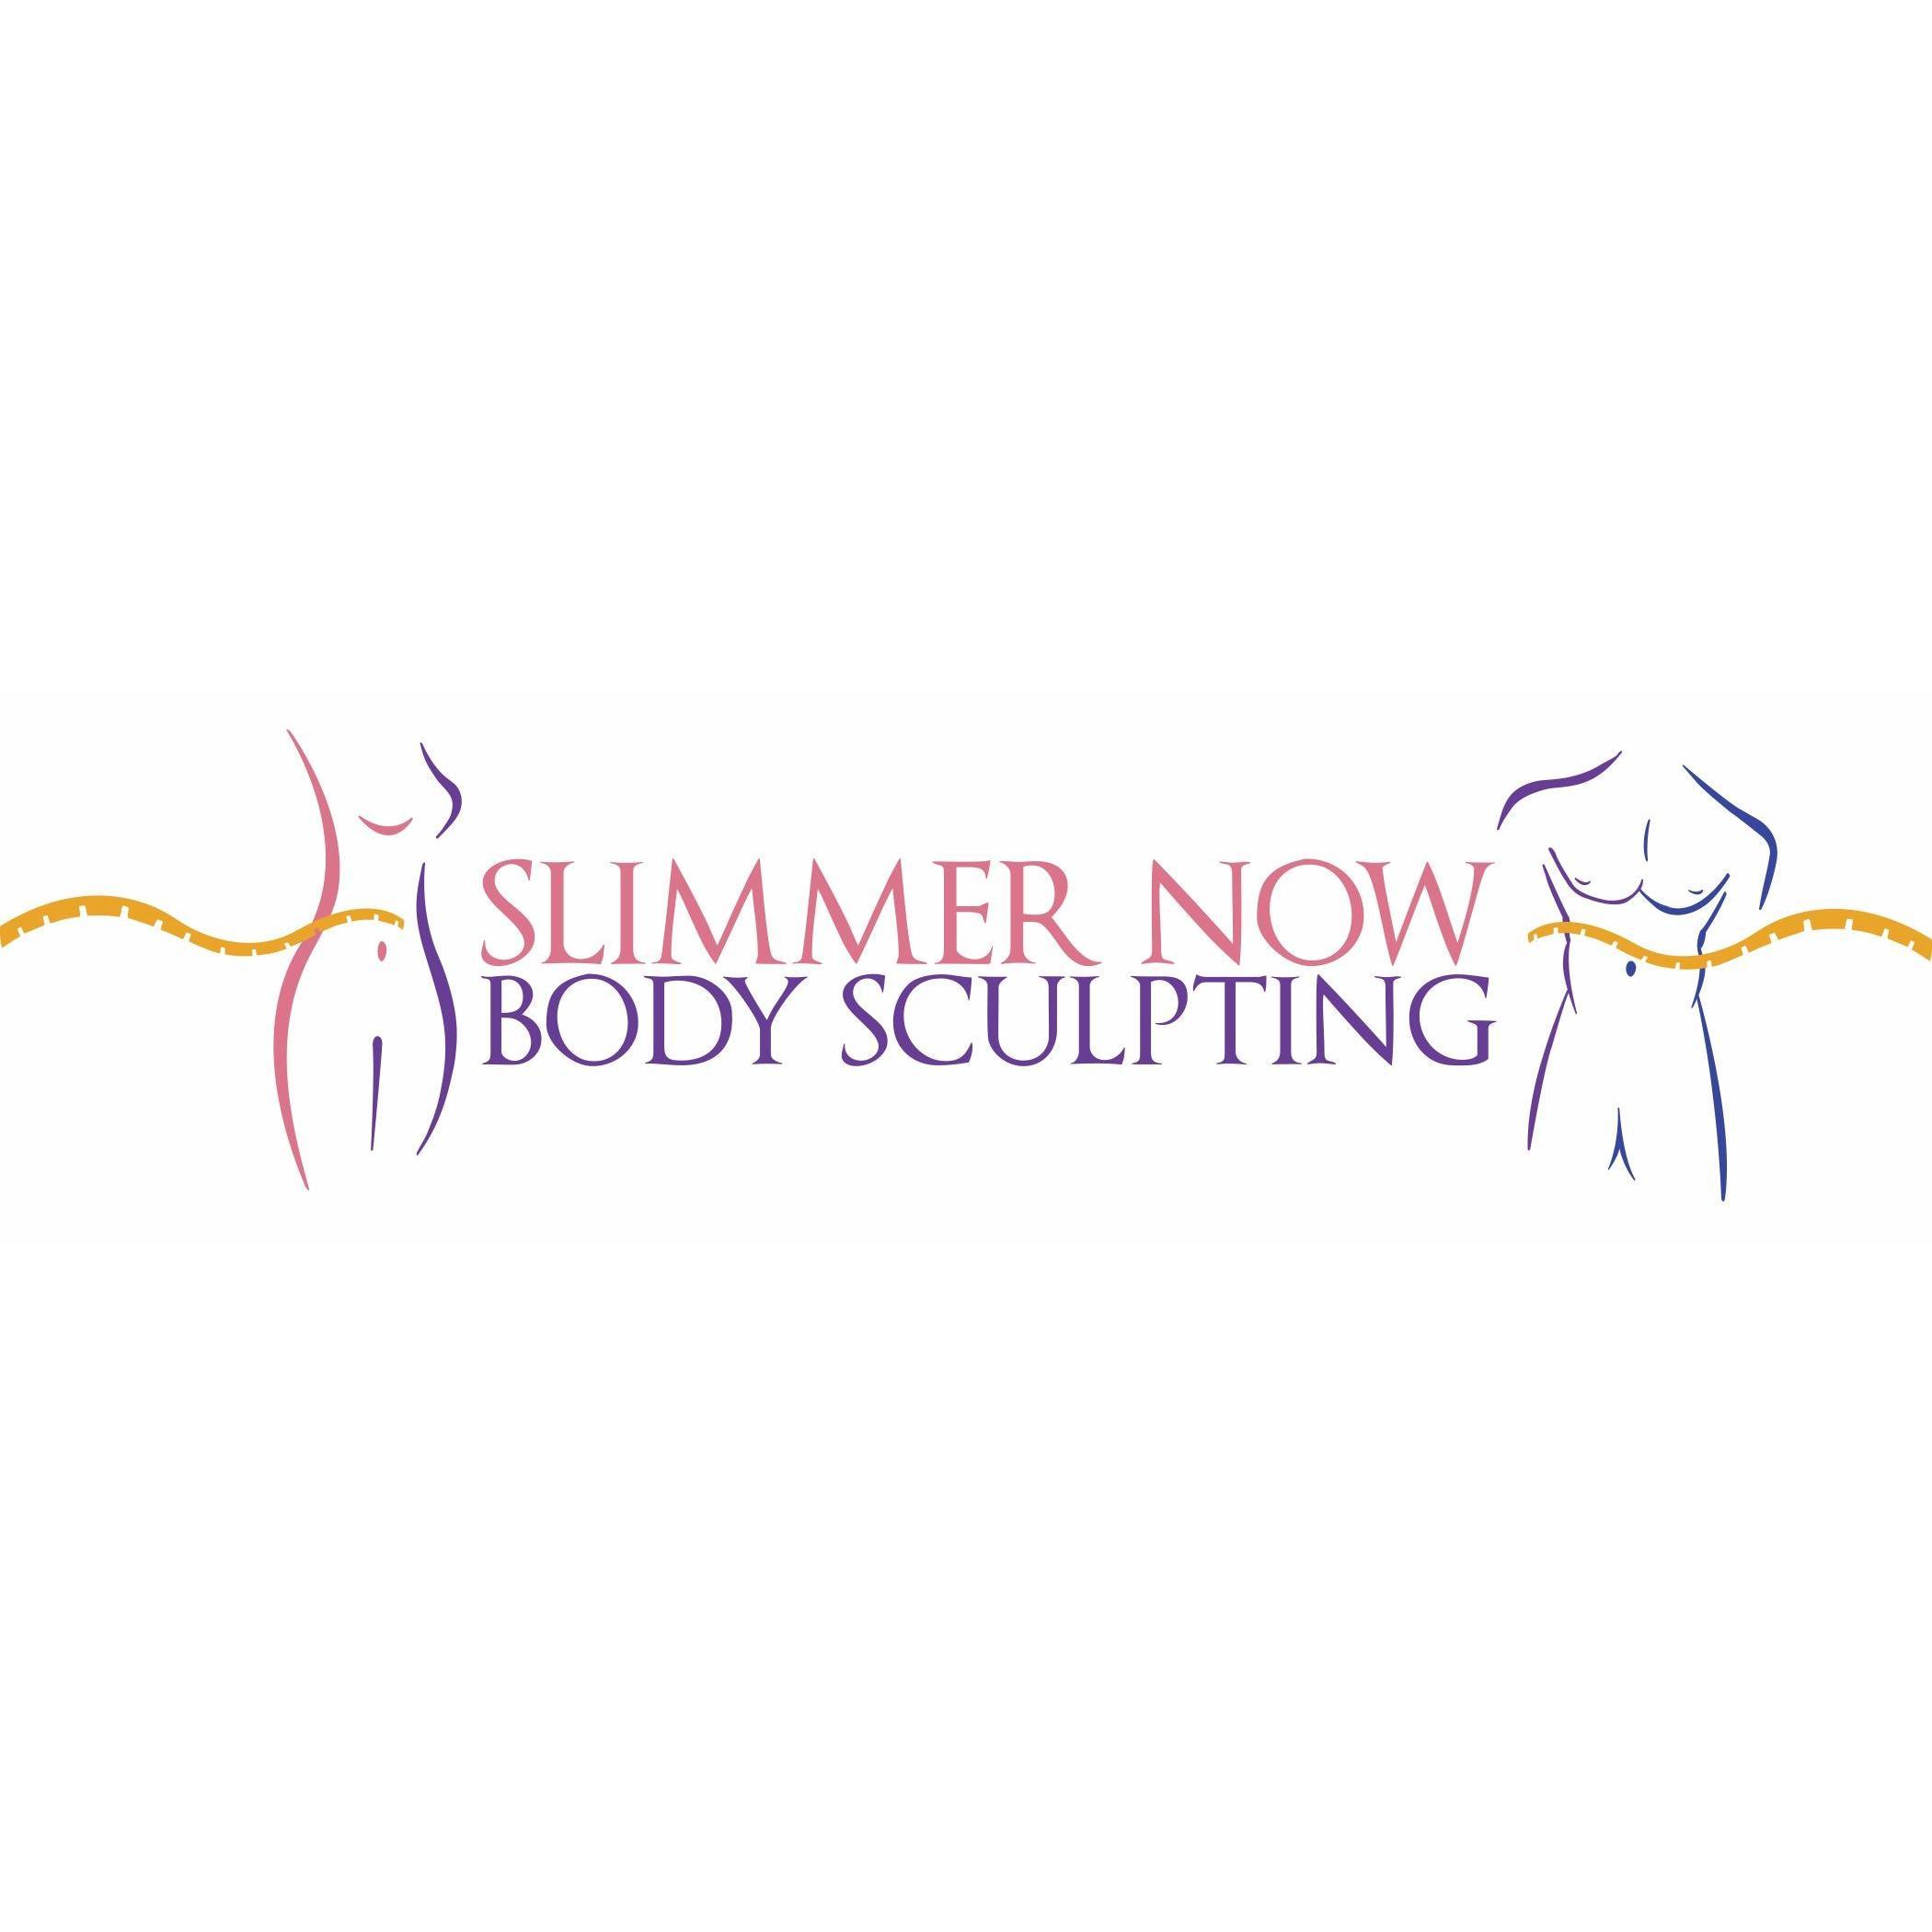 Slimmer Now Body Sculpting